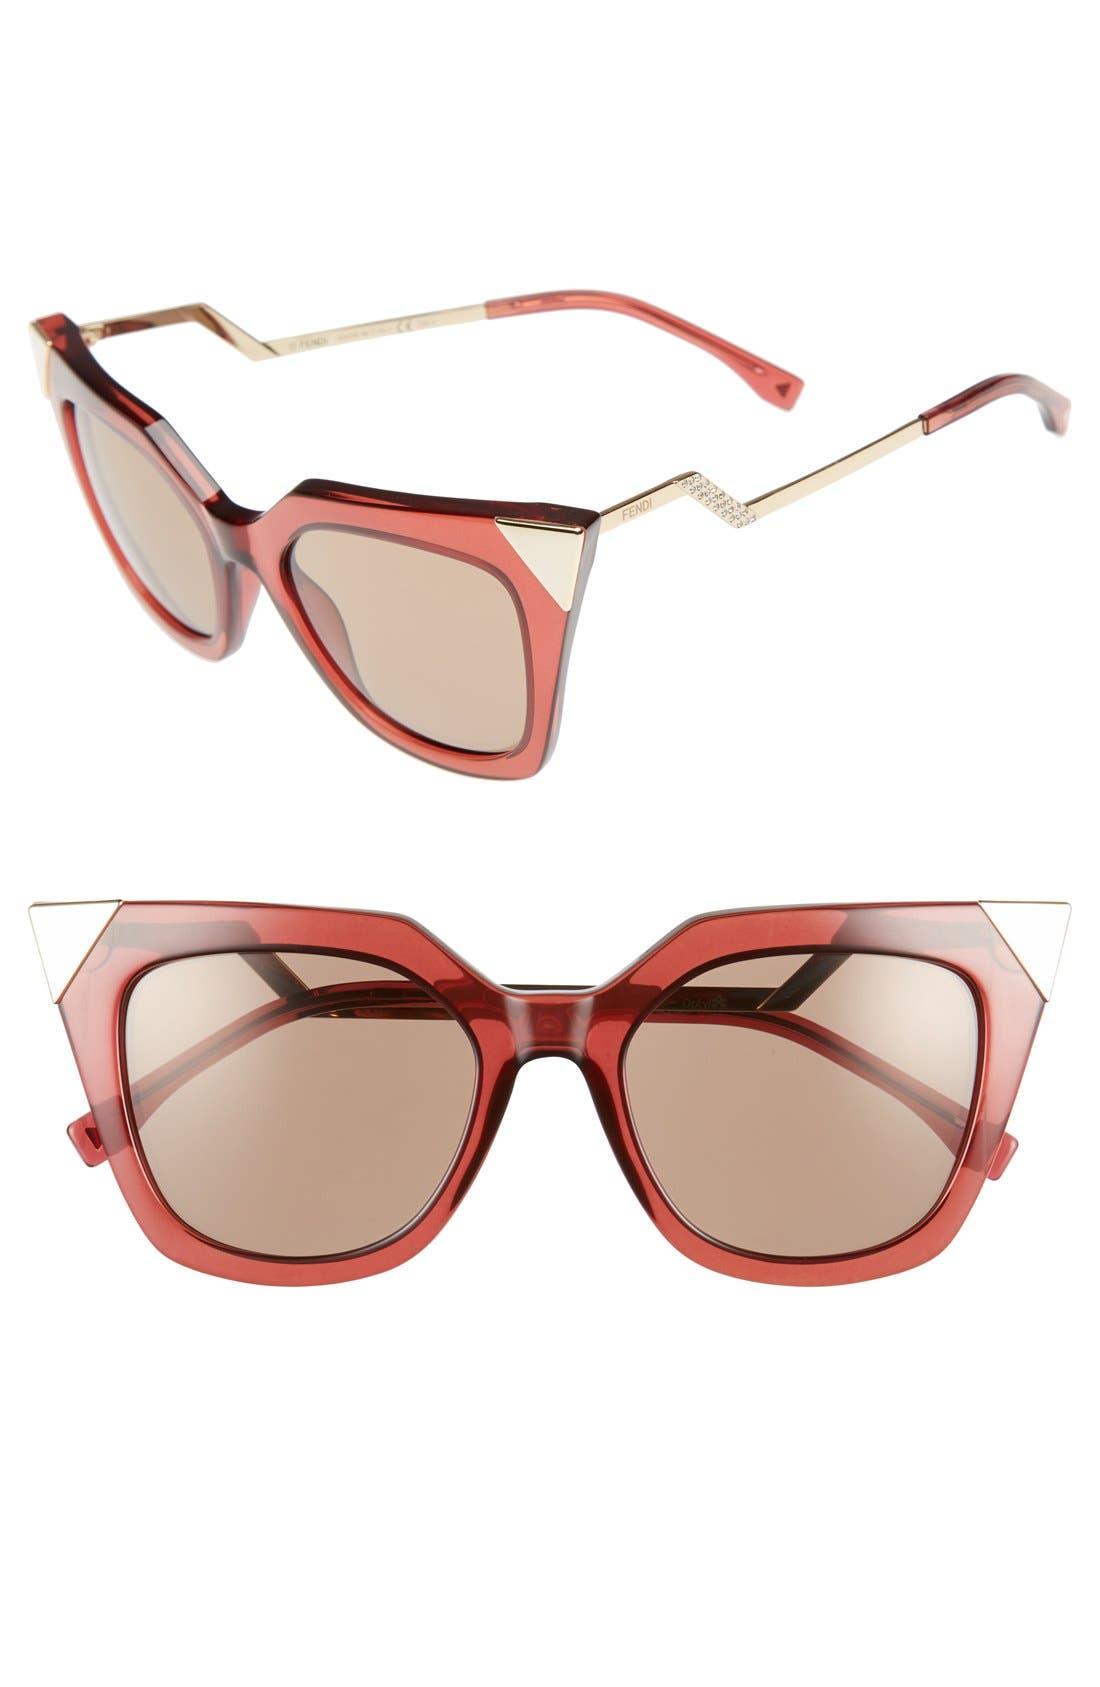 52mm Cat Eye Sunglasses,                             Main thumbnail 7, color,